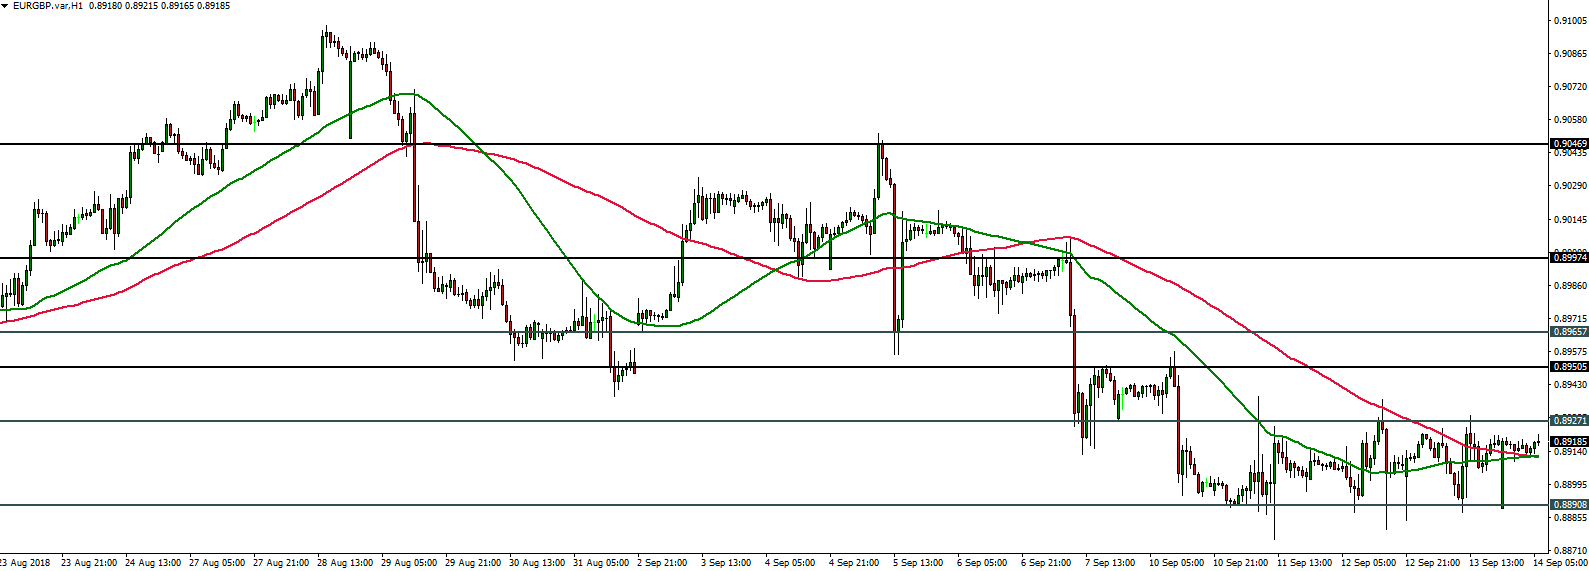 EURGBP - 14.09.2018